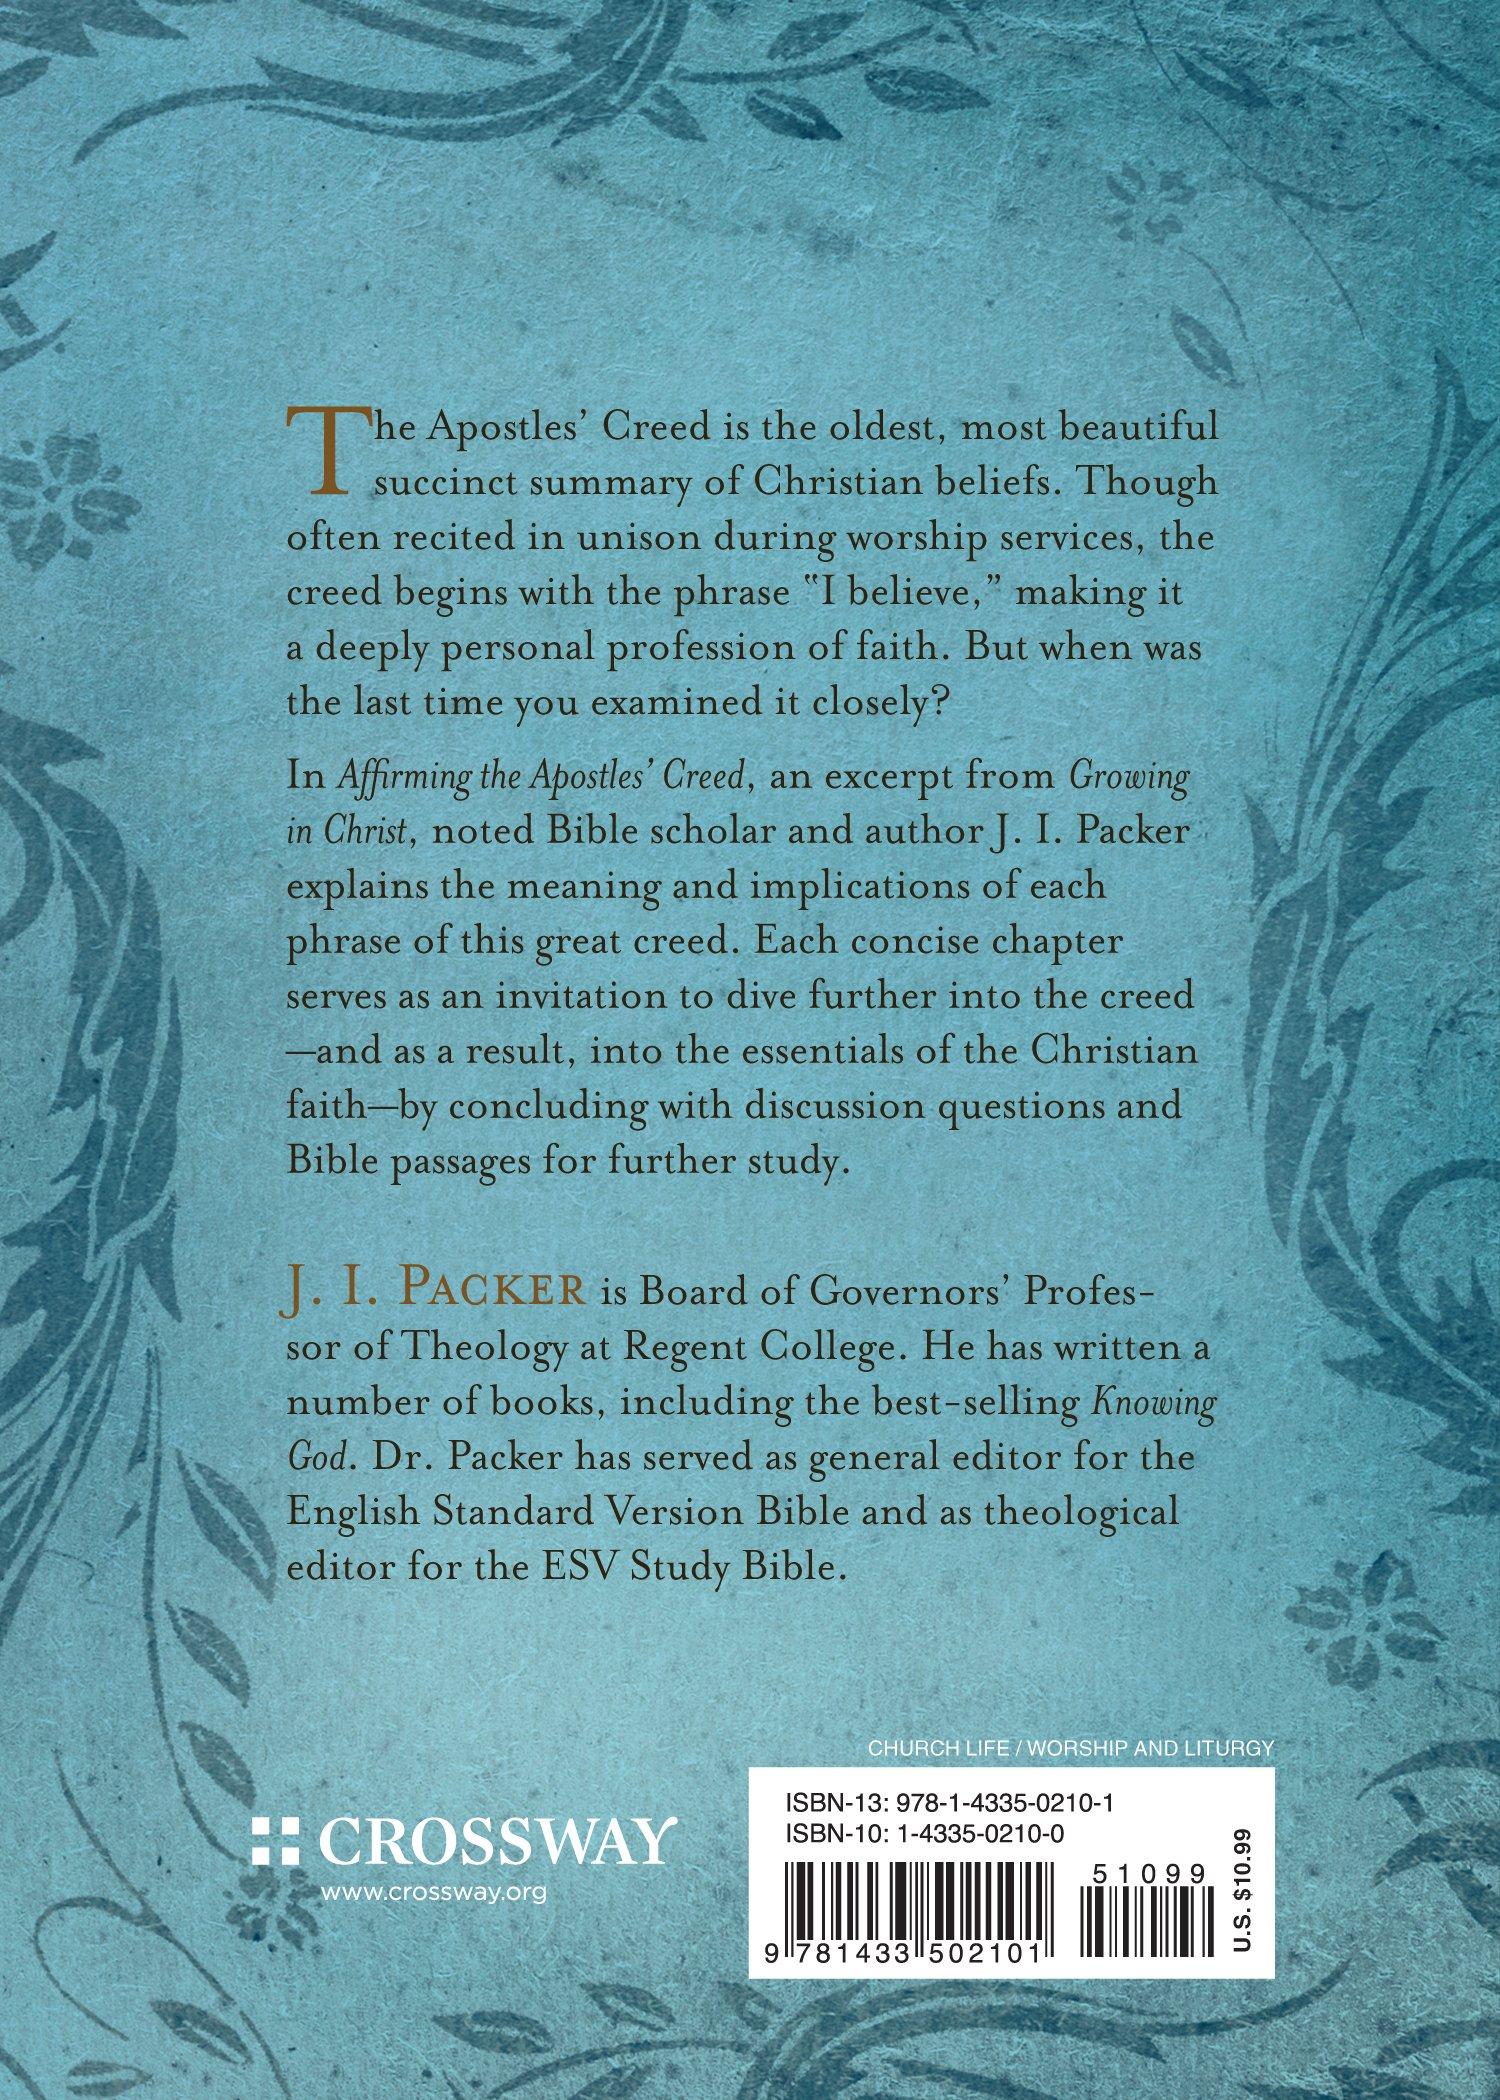 Affirming the Apostles' Creed: J. I. Packer: 9781433502101: Amazon ...